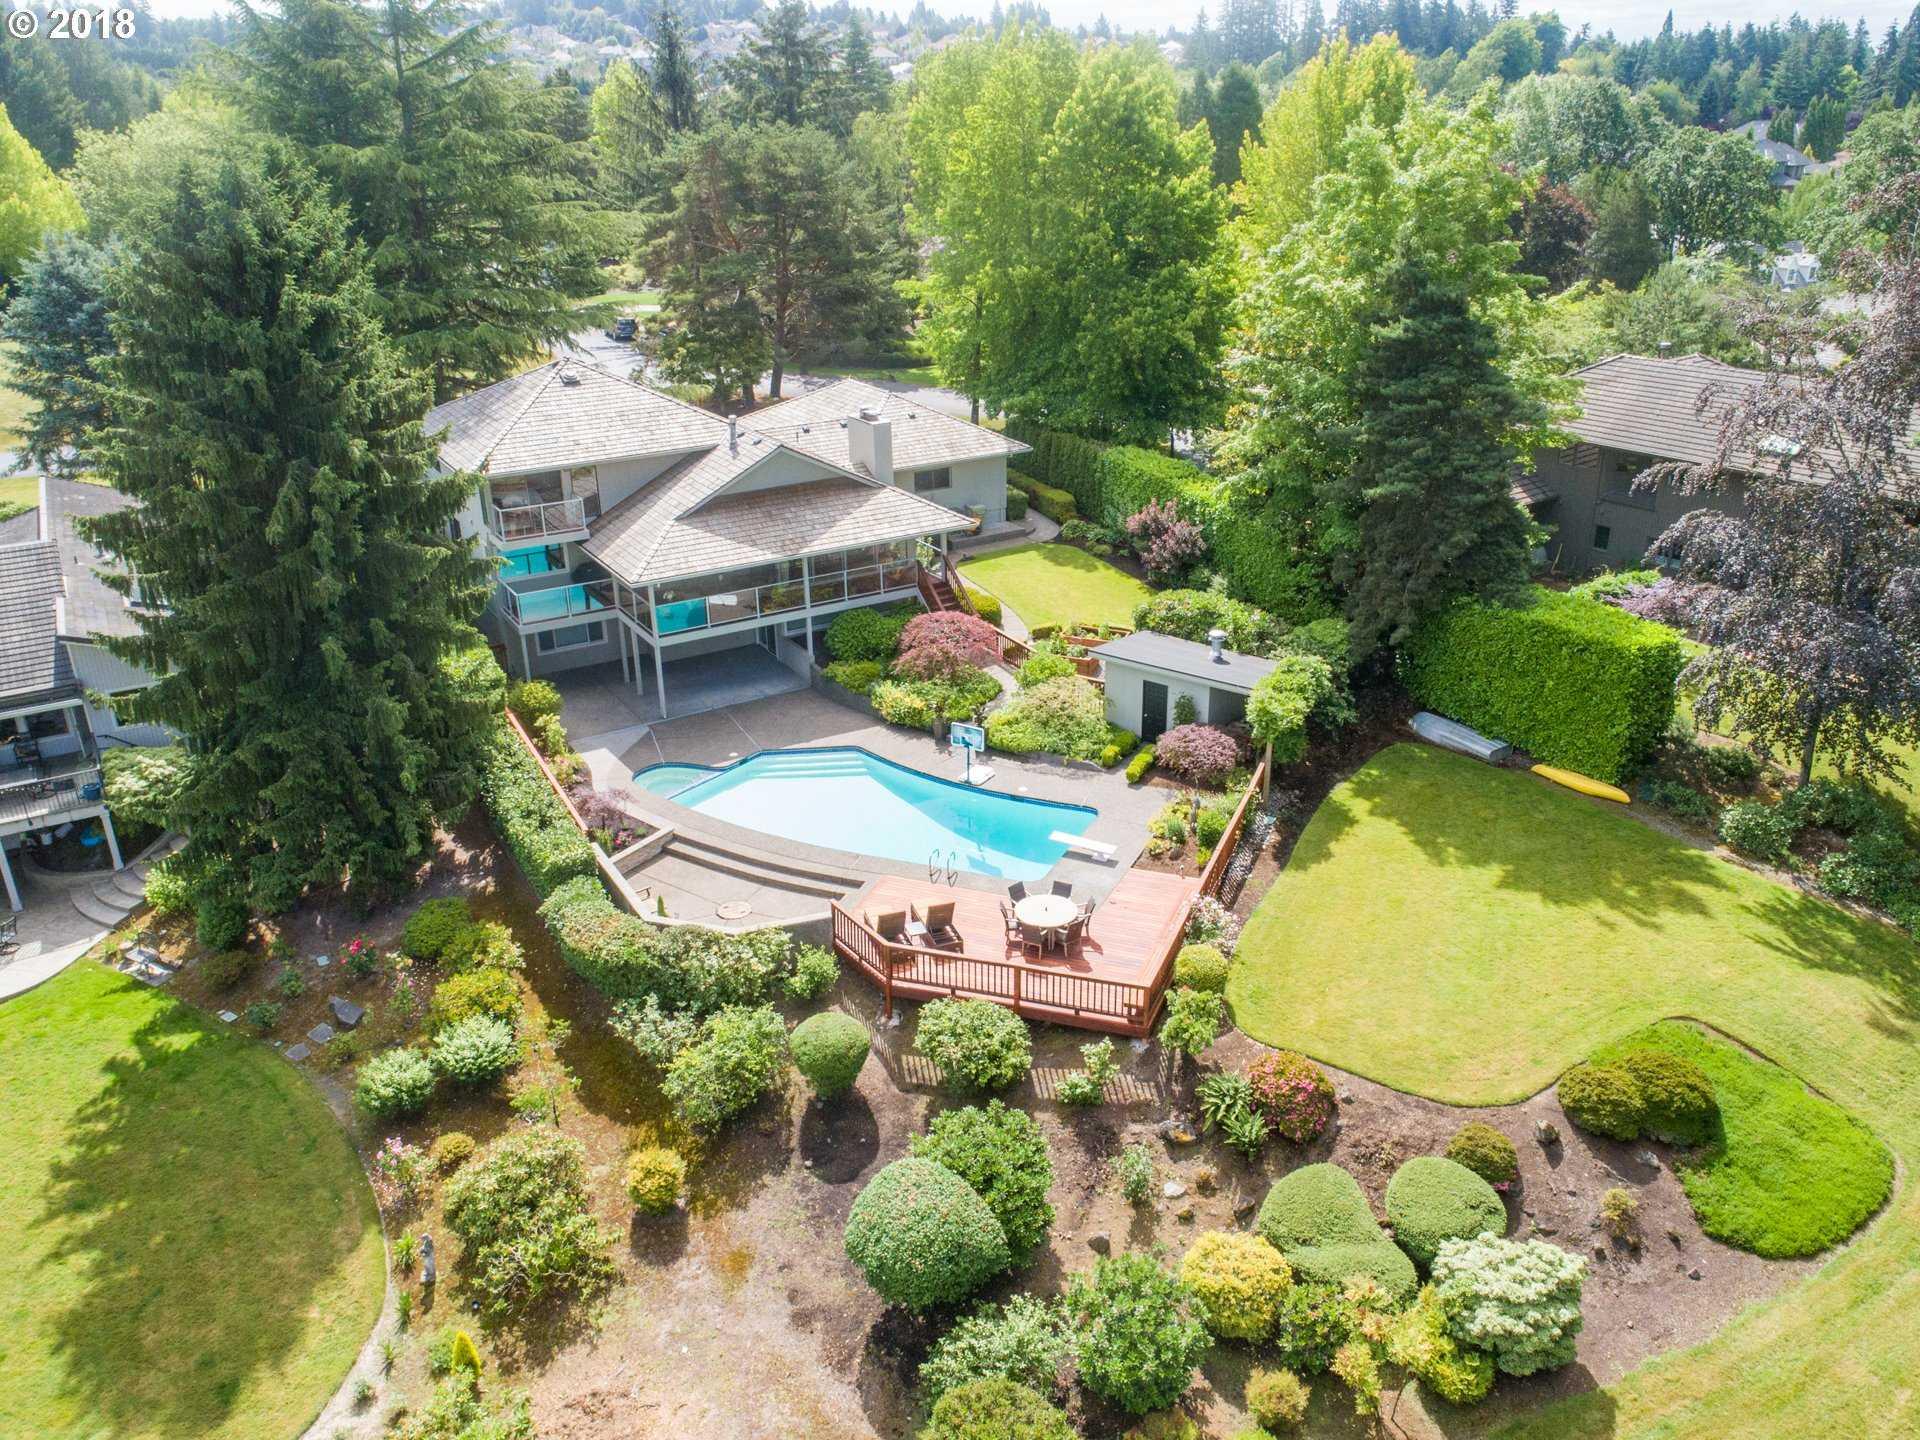 $1,650,000 - 4Br/4Ba -  for Sale in Hartung Farms, Portland